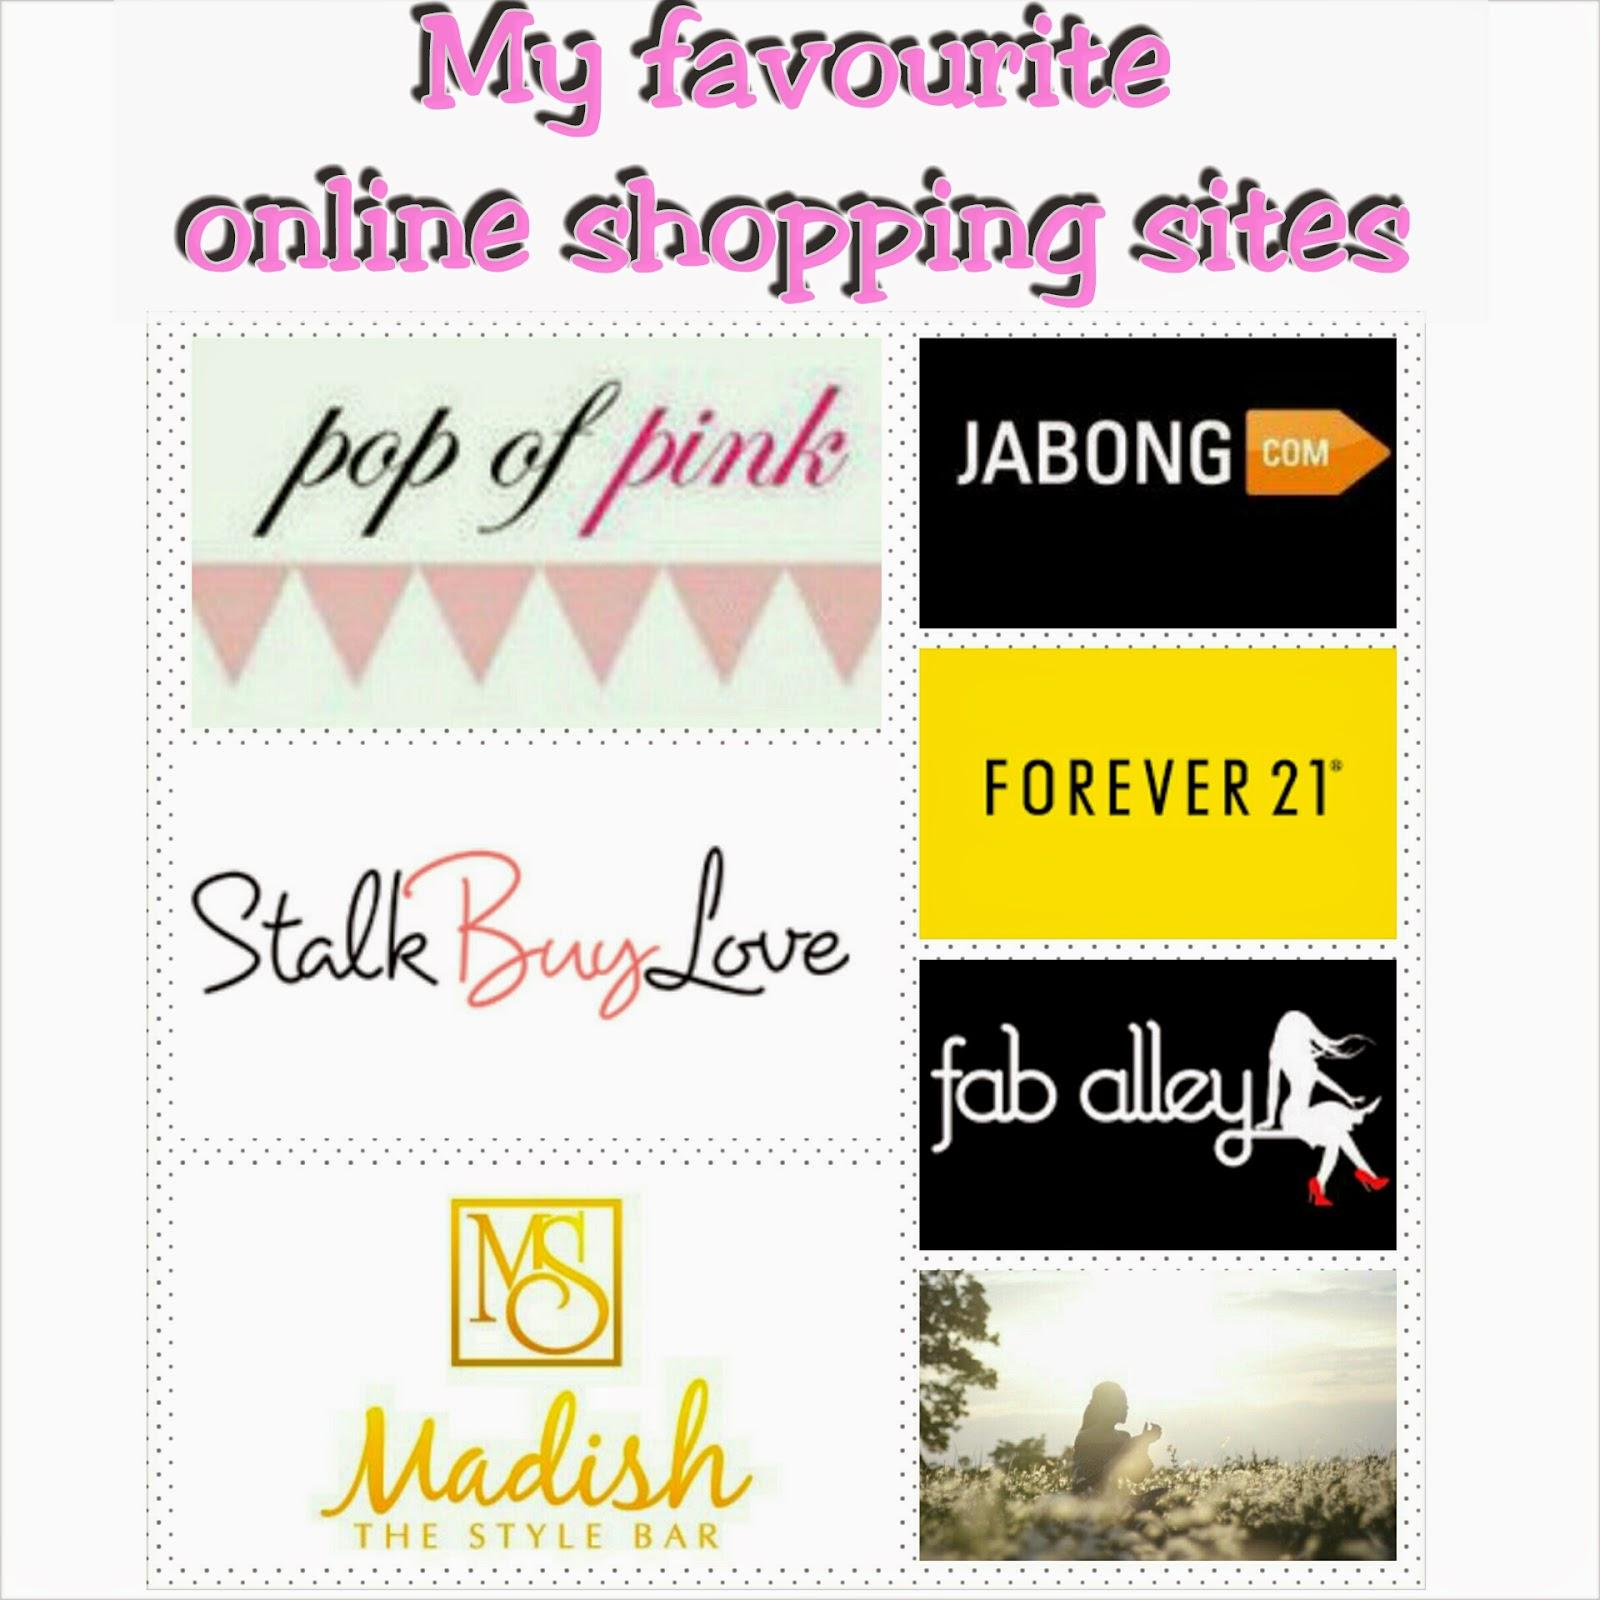 Fashionlovebytes 2014 09 28